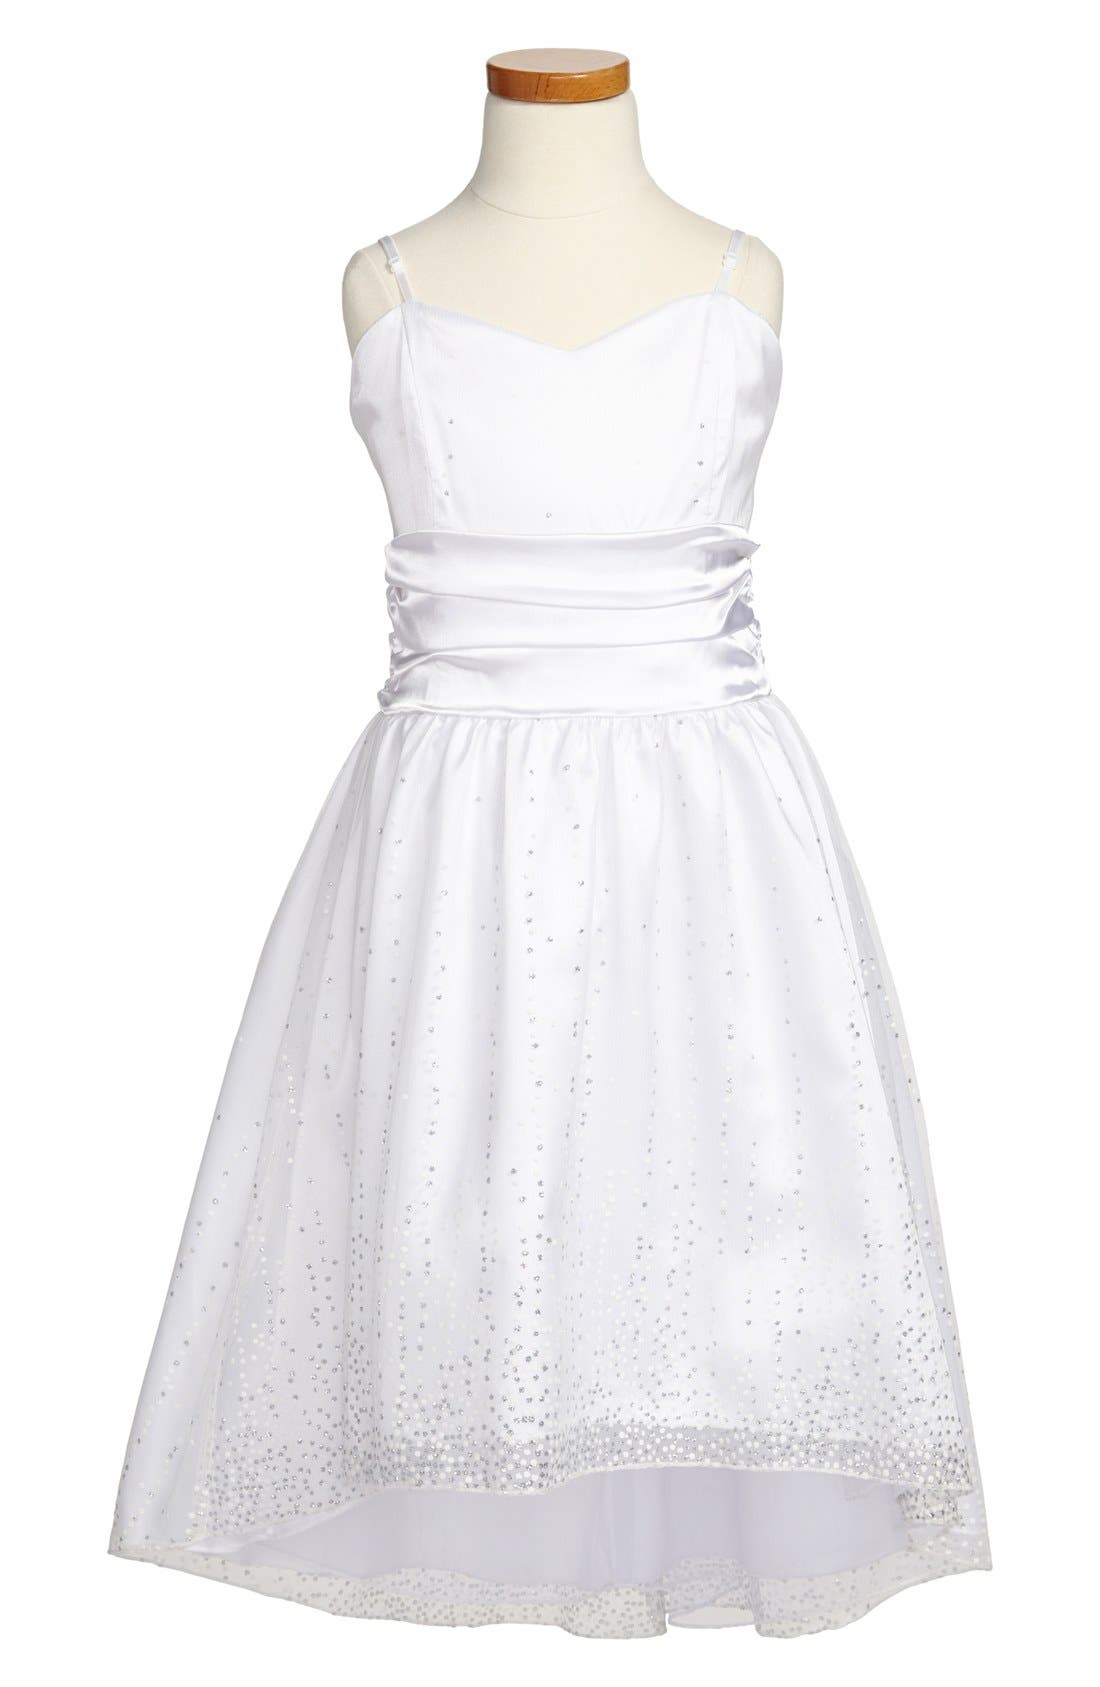 Alternate Image 1 Selected - Un Deux Trois 'Sequin Spray' High/Low Dress (Big Girls)